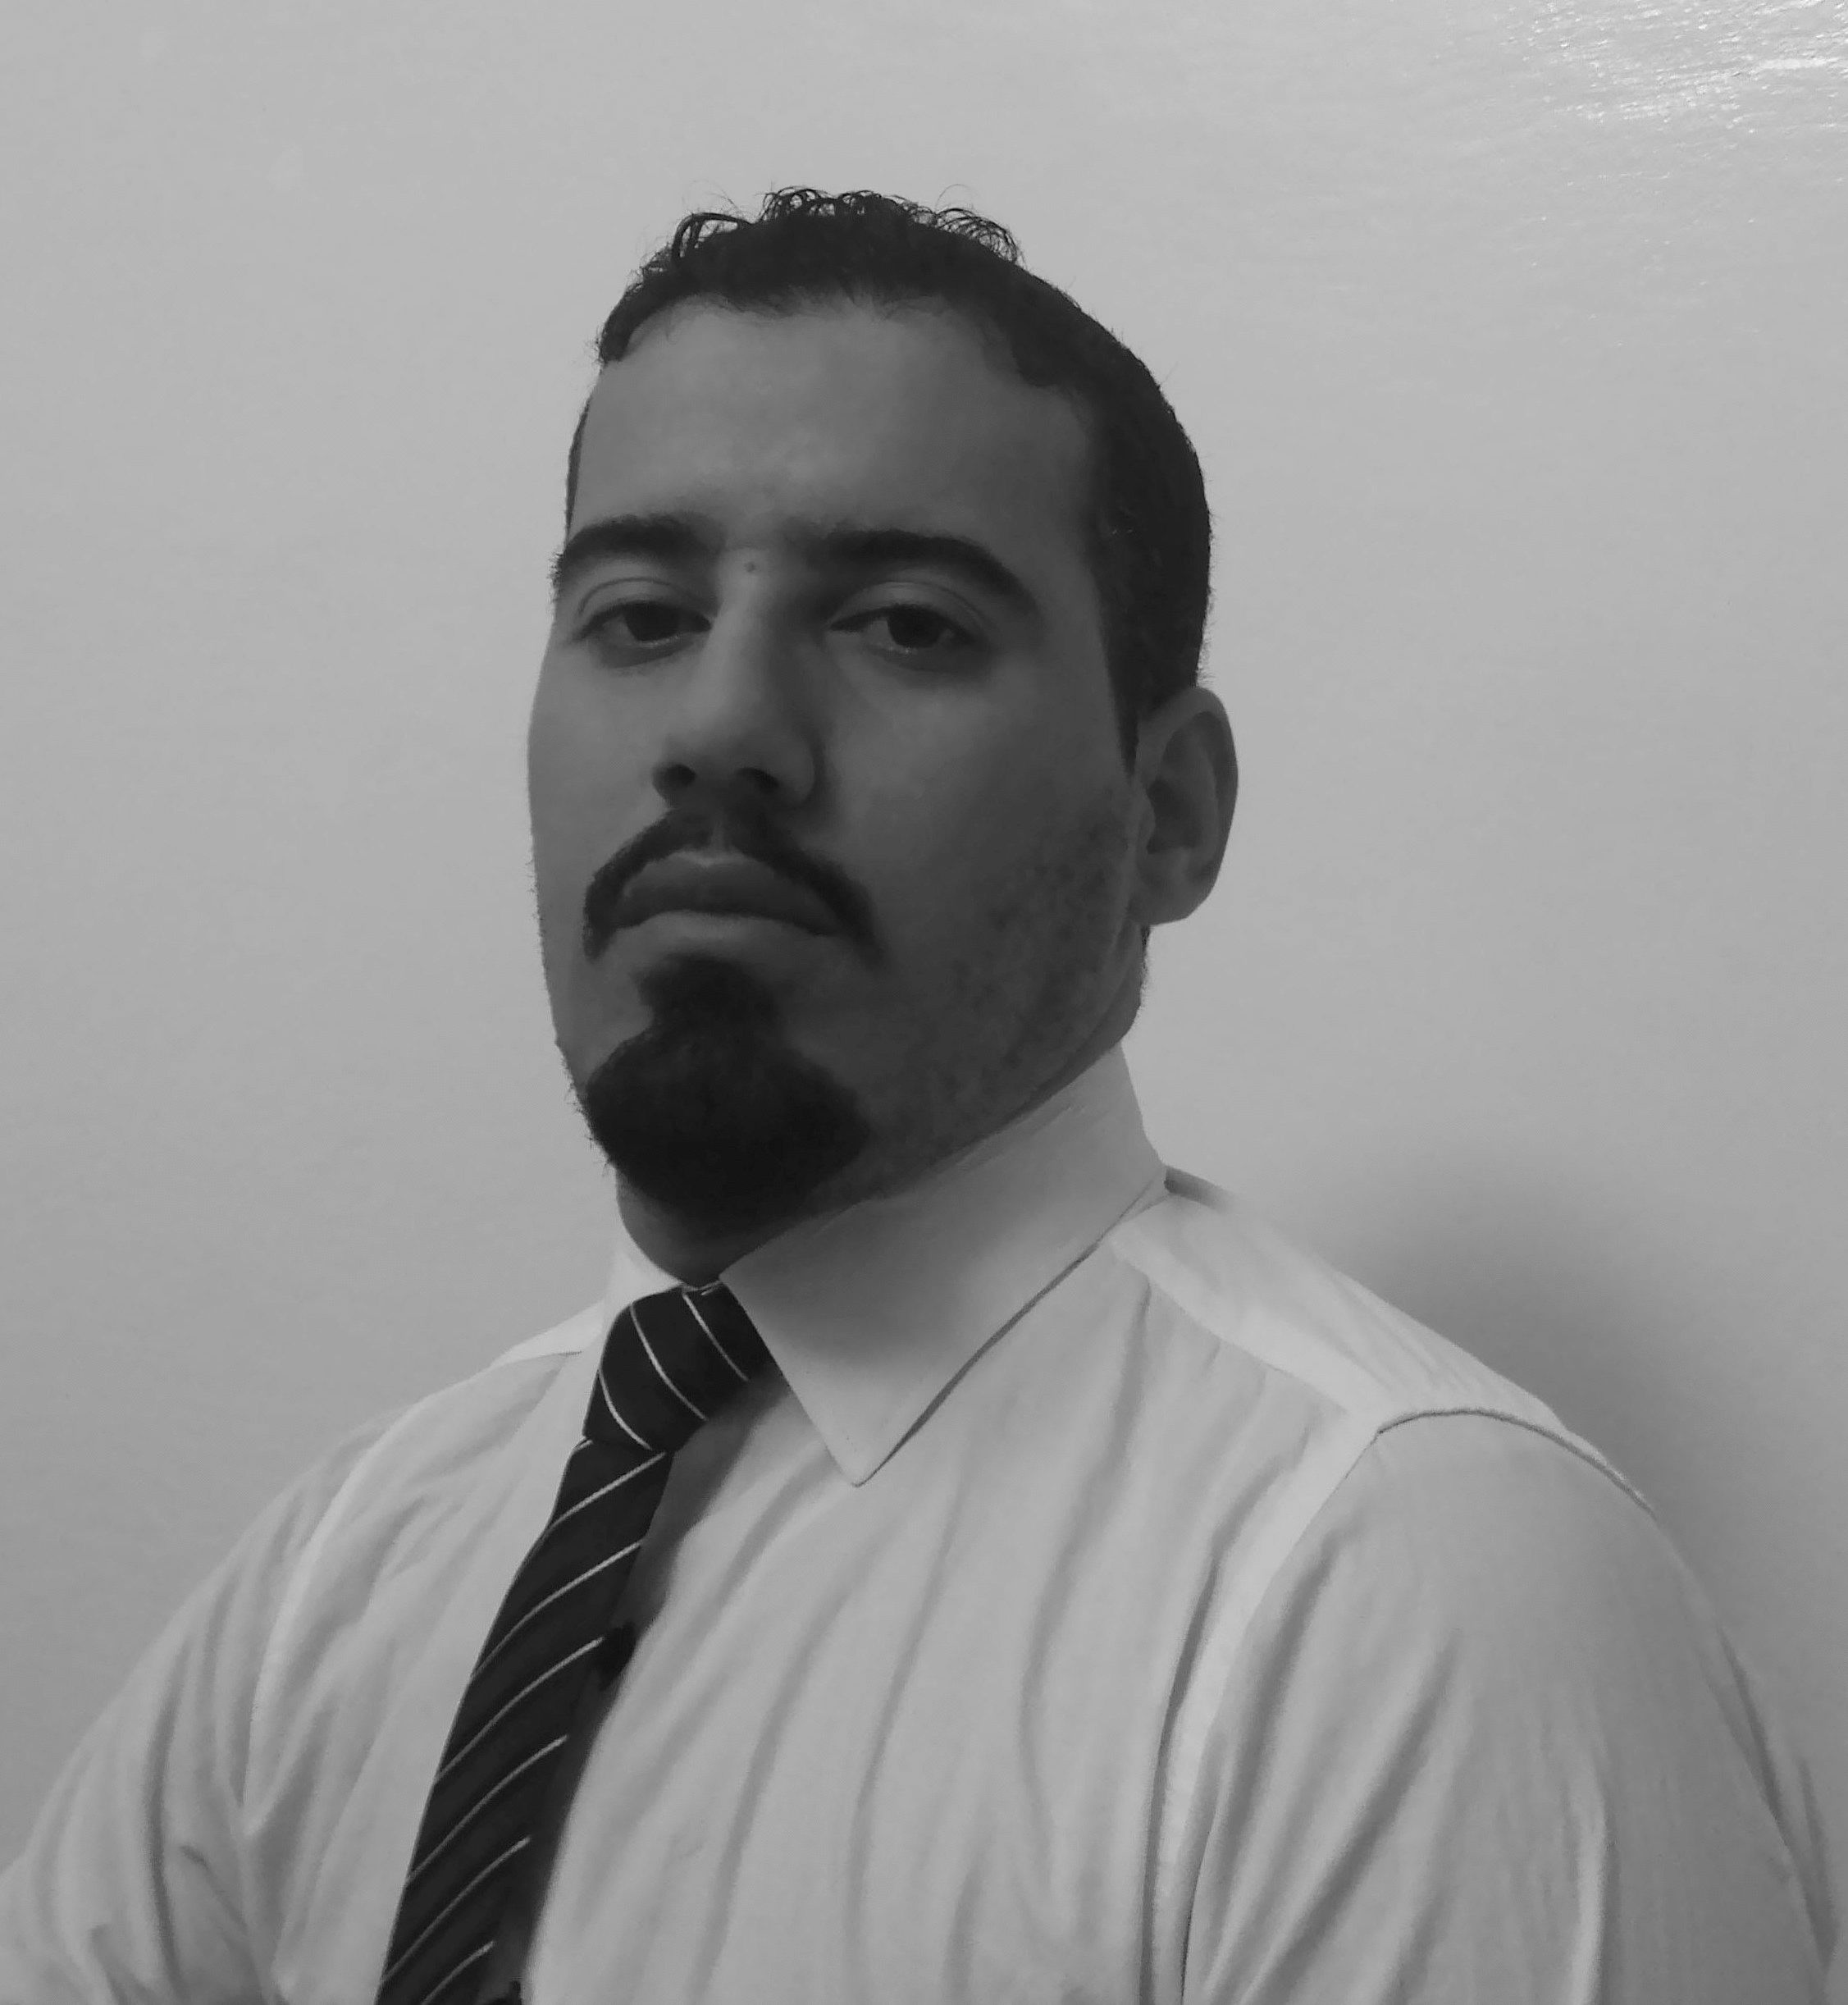 حسن رشيدي  Headshot